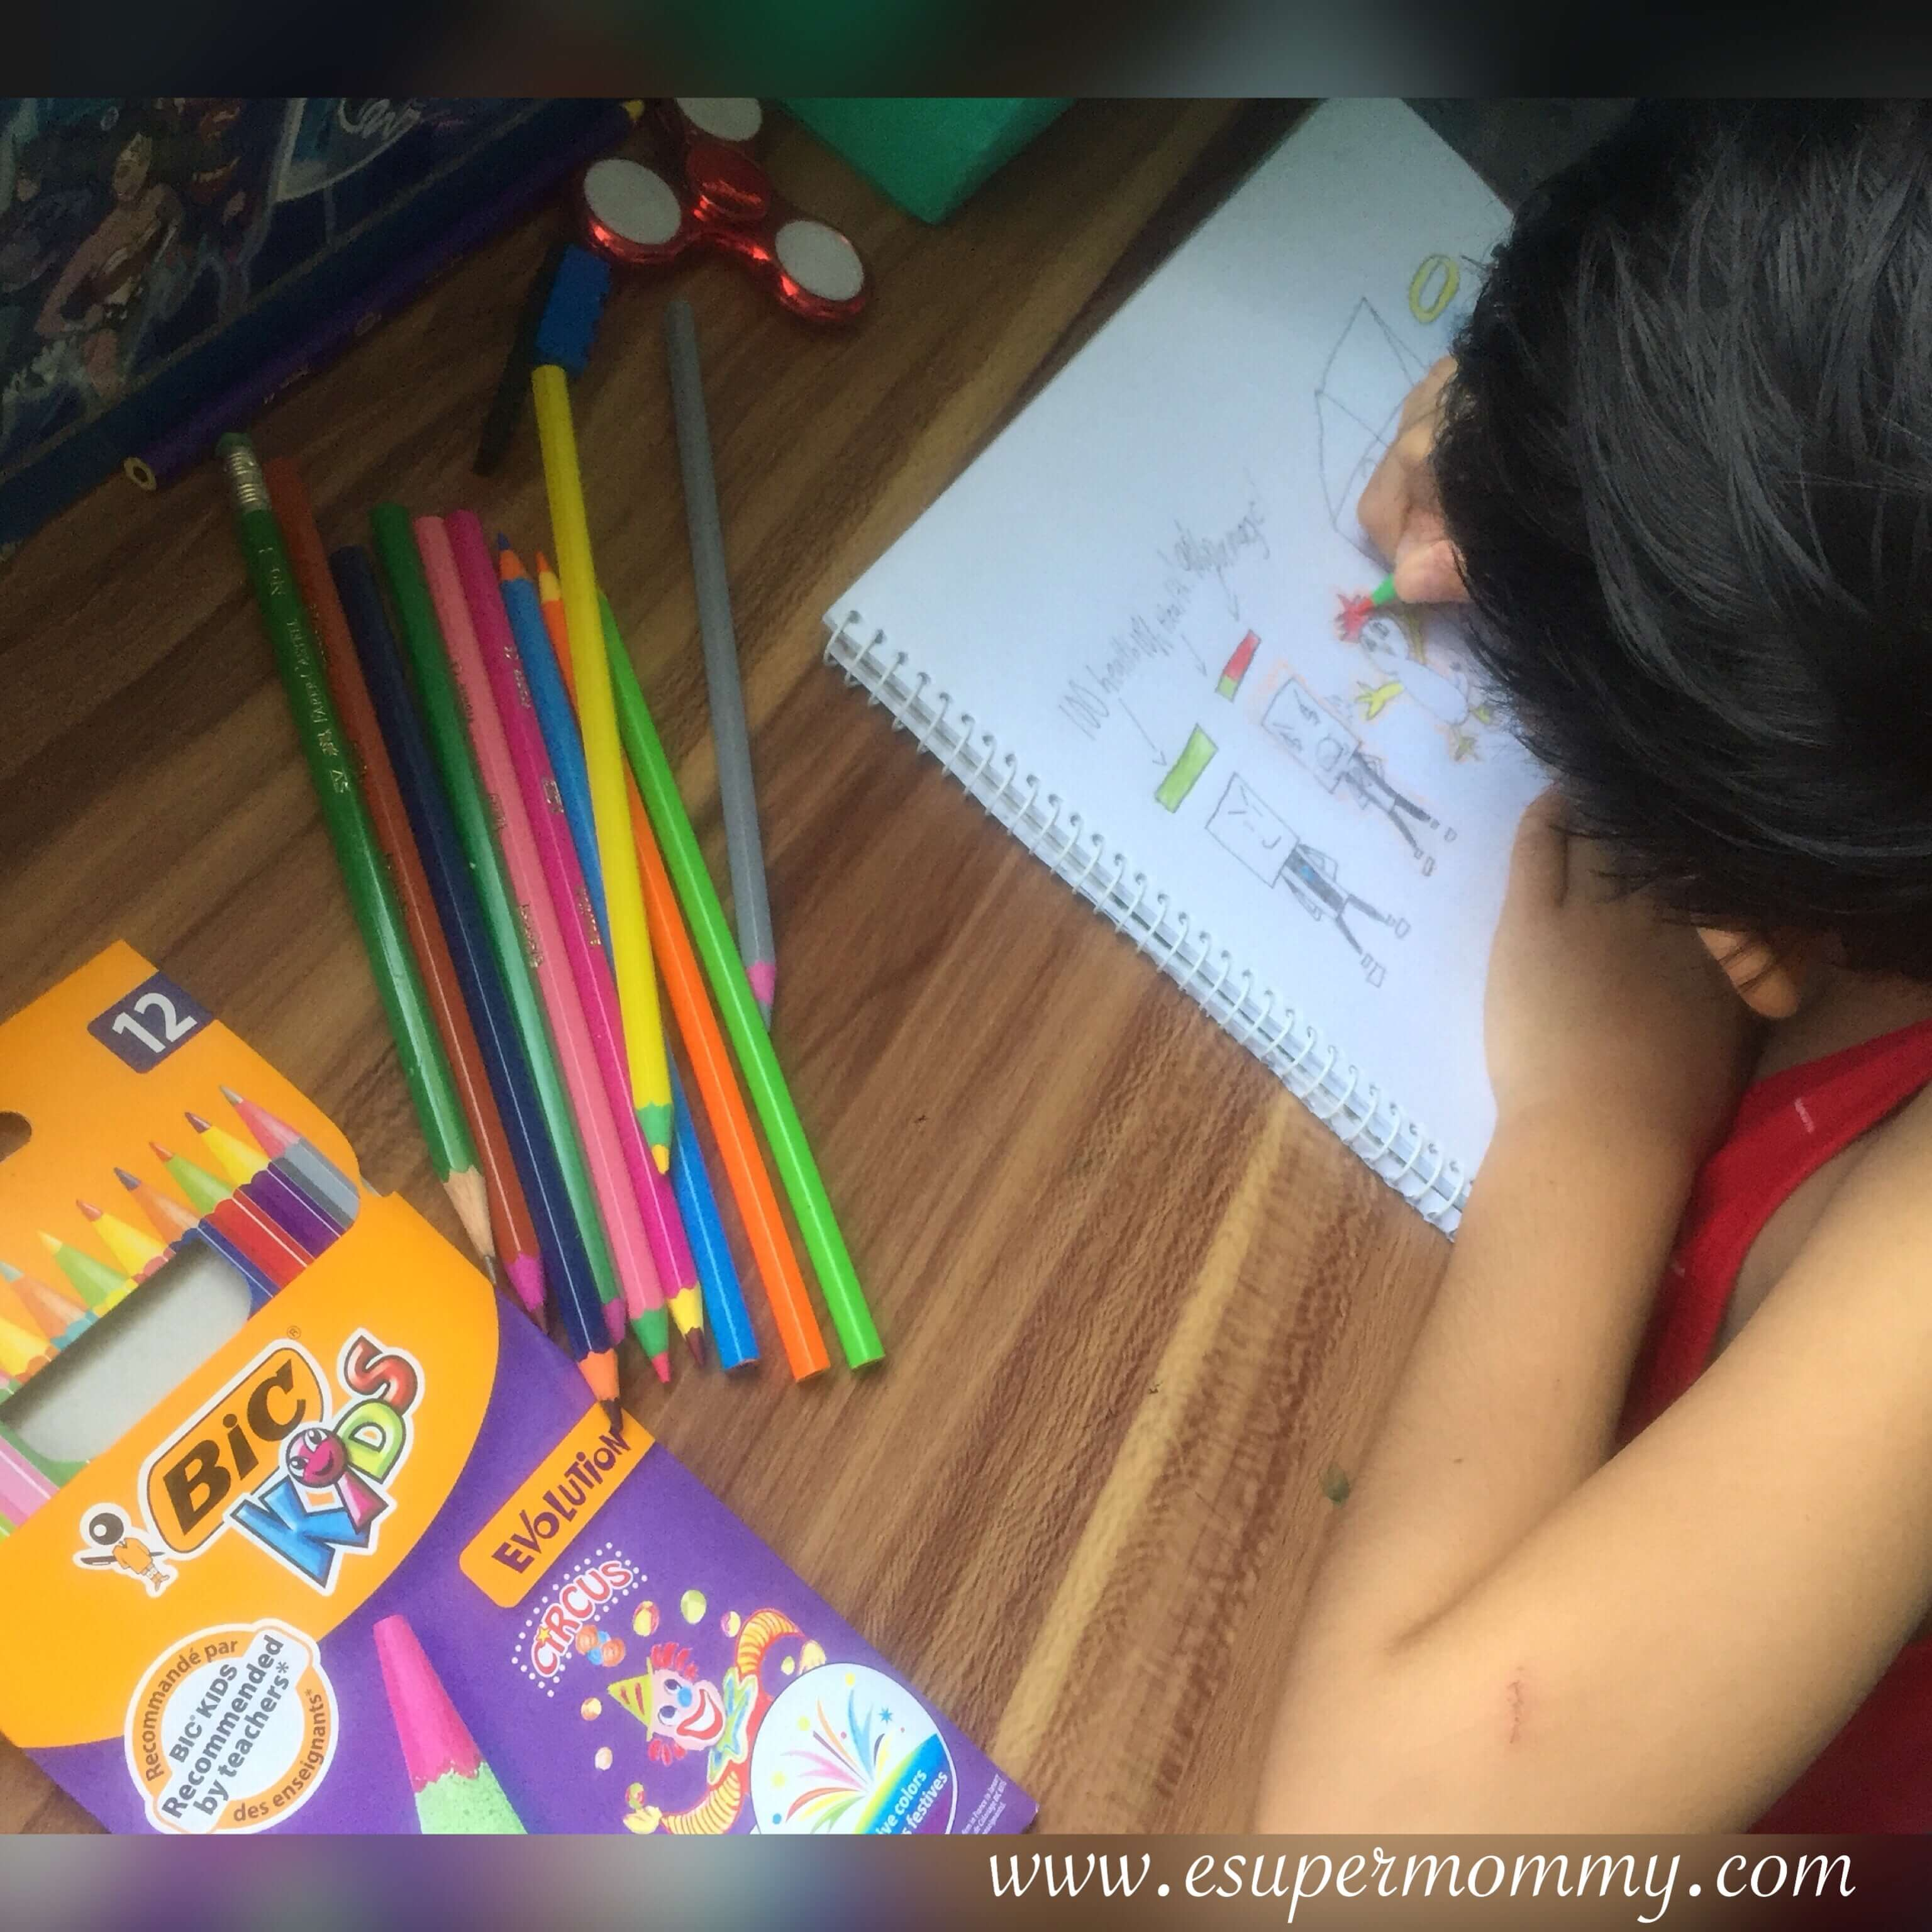 BIC Kids' word-free evolution